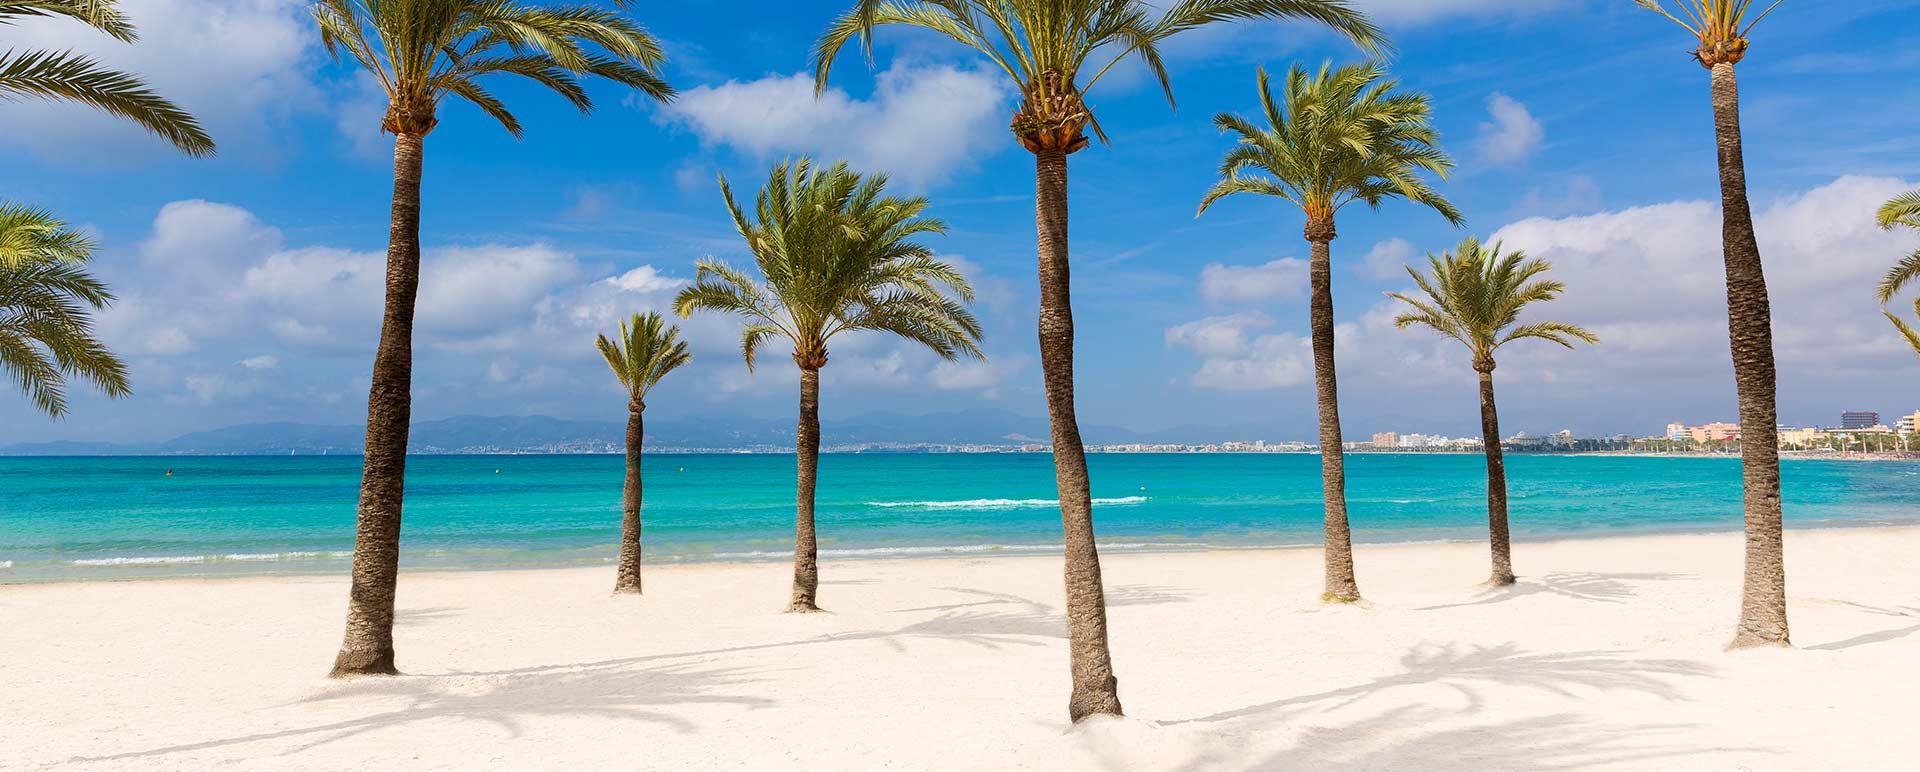 El Arenal - Palma Mallorca